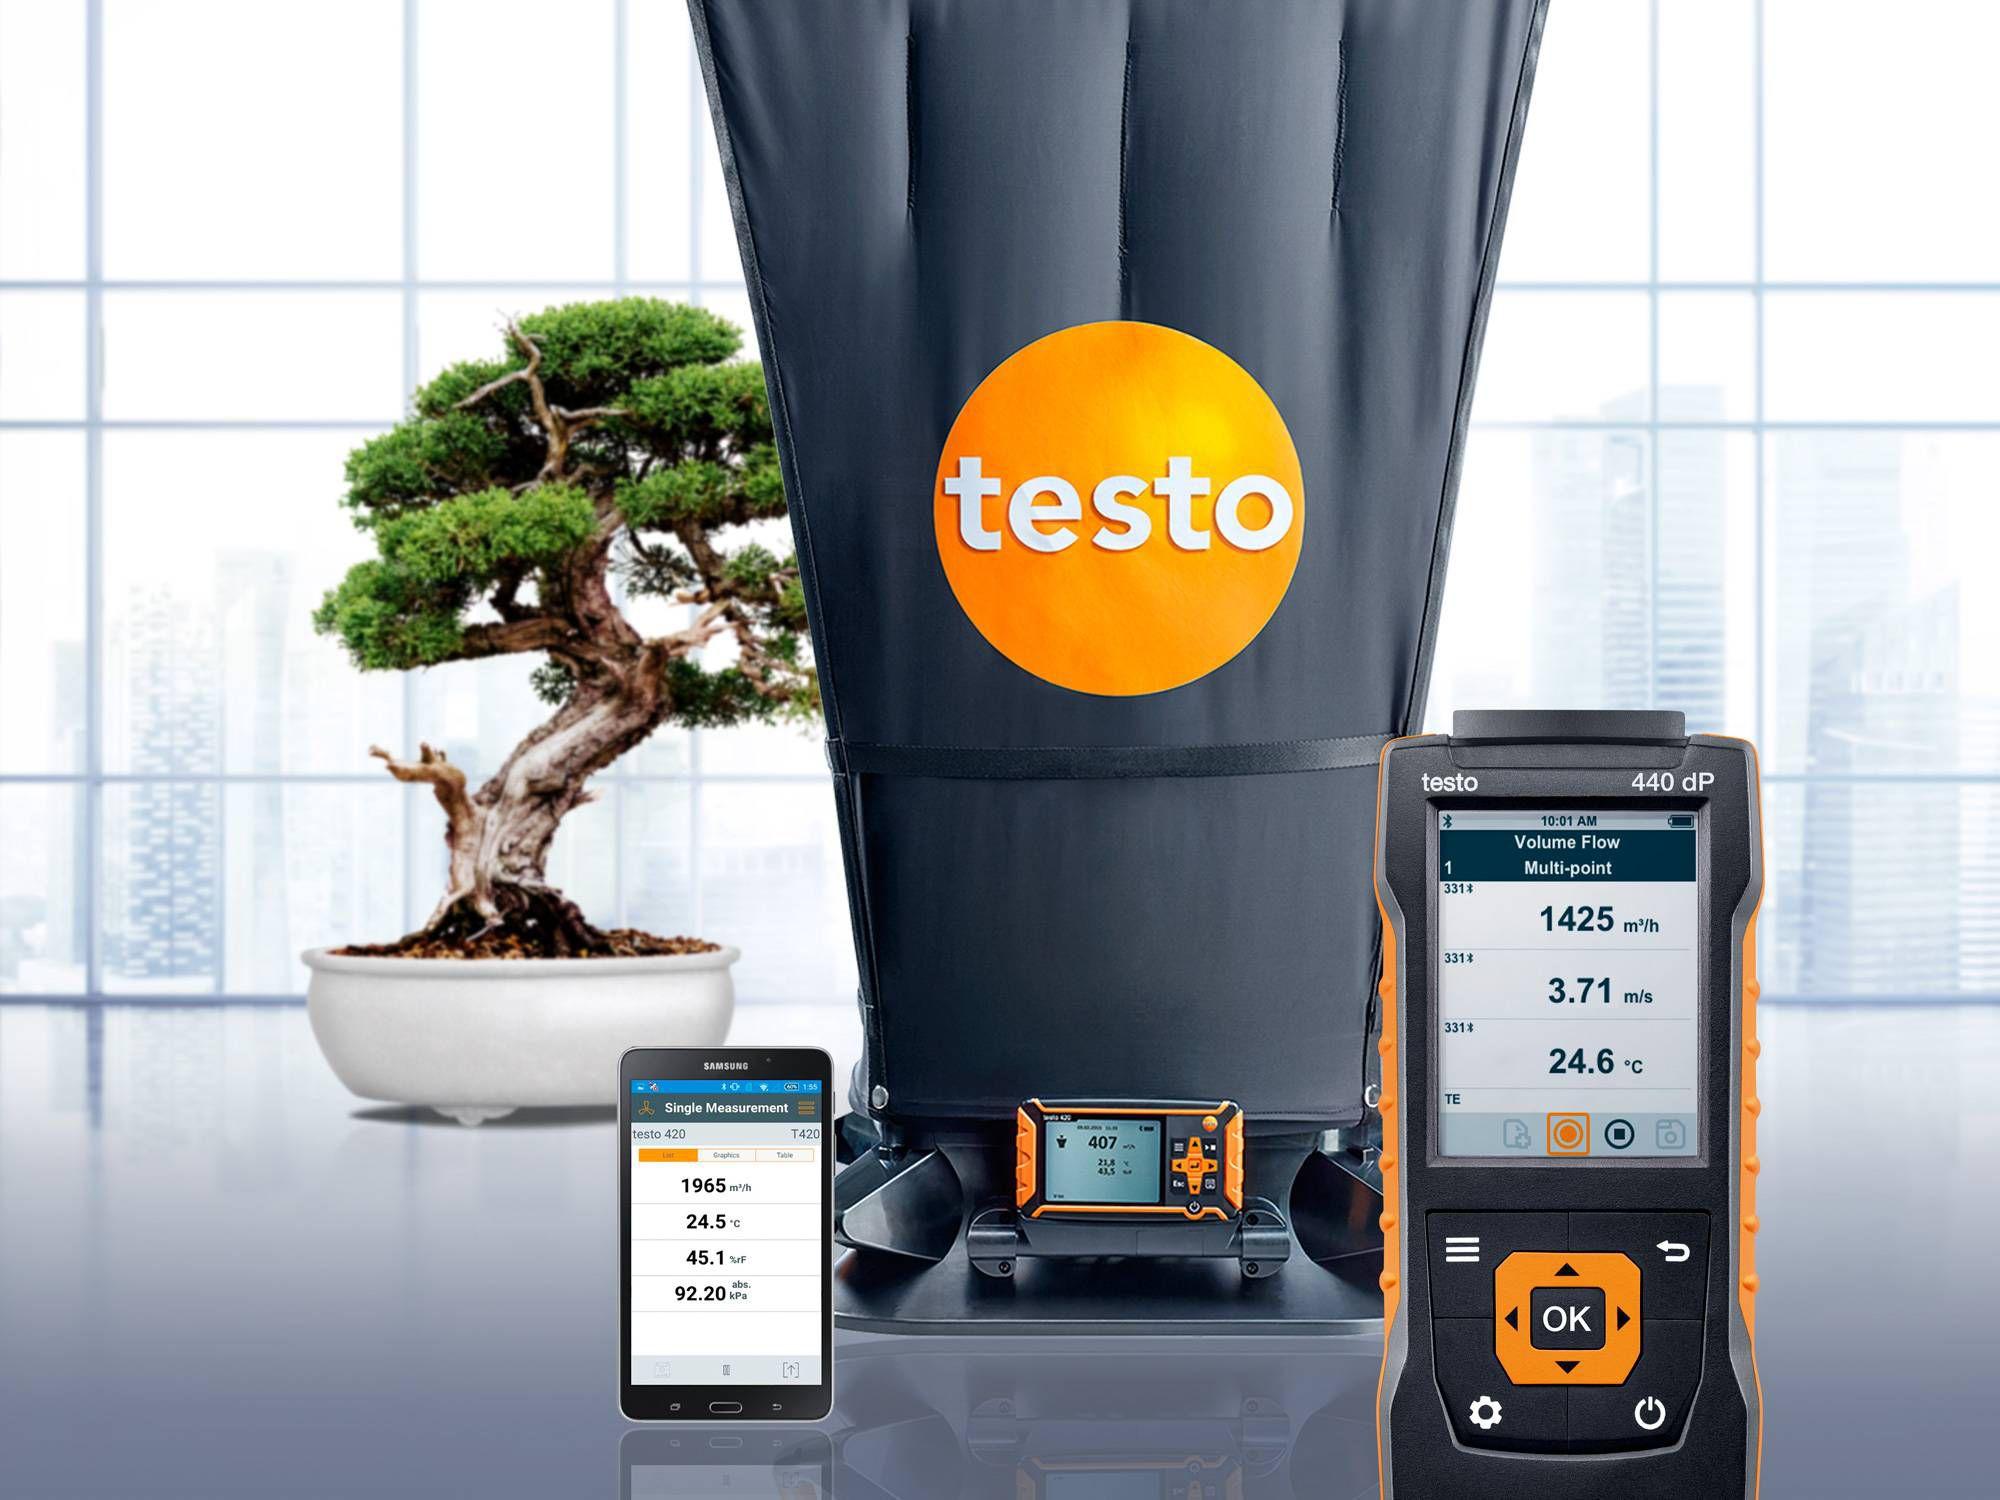 The new testo 440 air velocity & IAQ measuring instrument